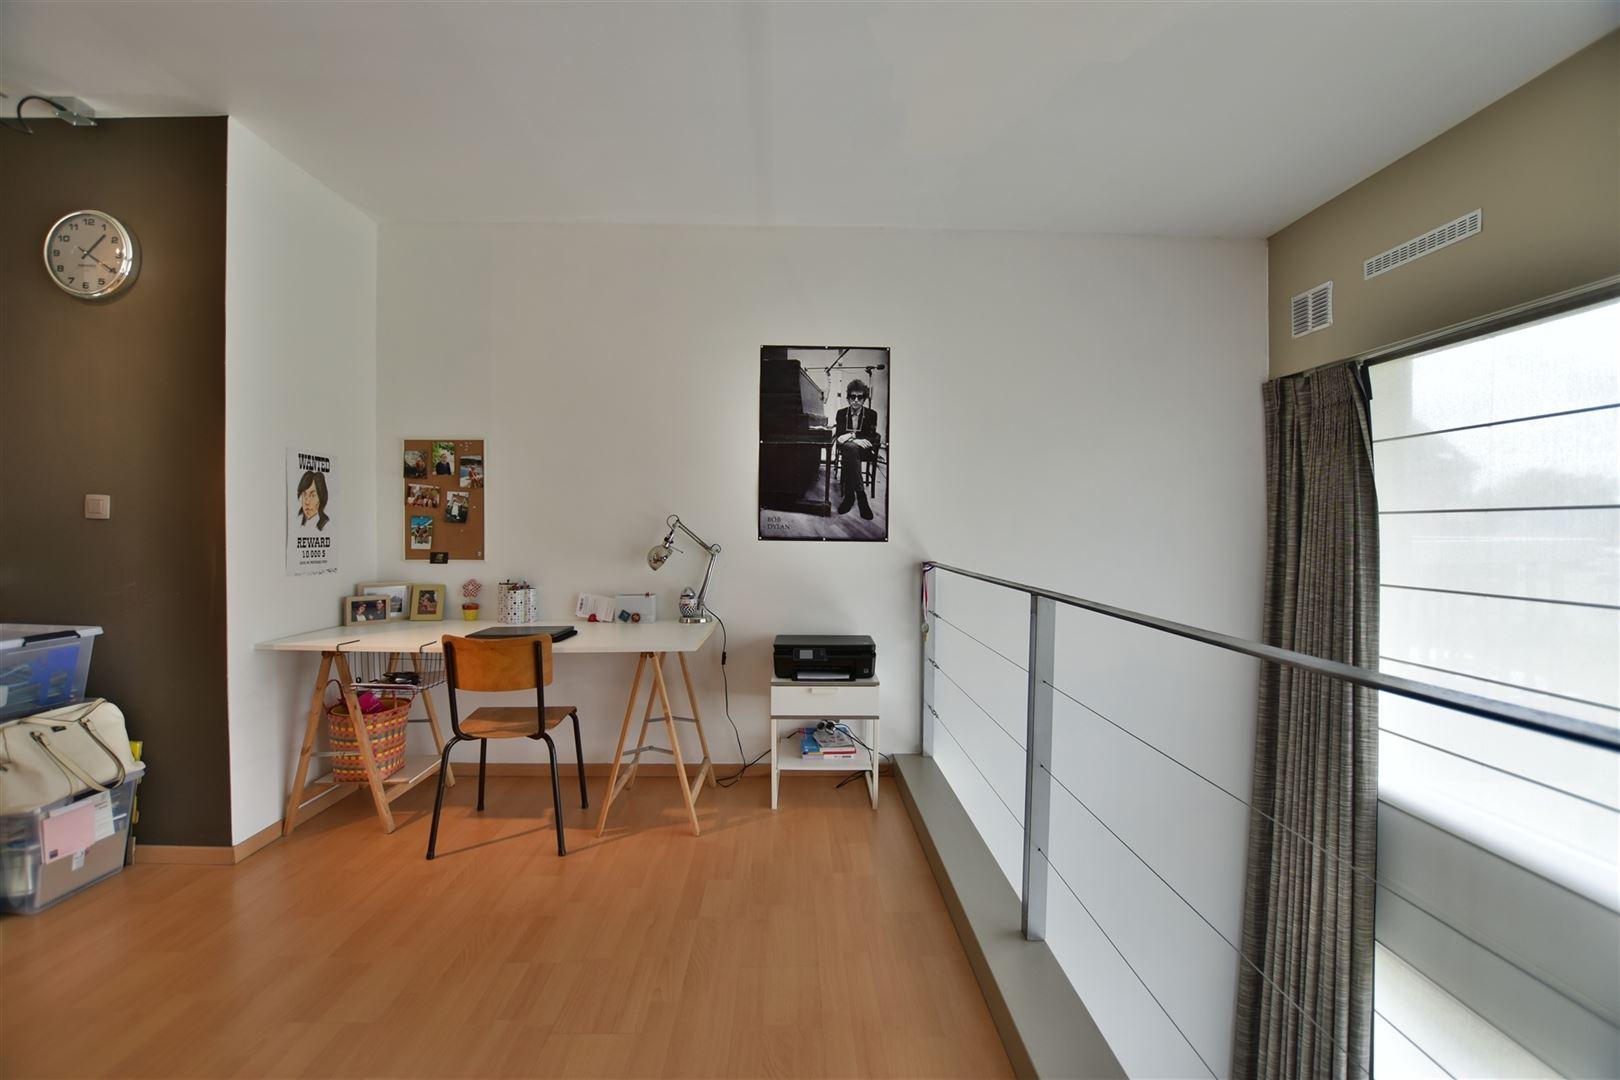 Foto 8 : Appartement te 9200 DENDERMONDE (België) - Prijs € 199.000